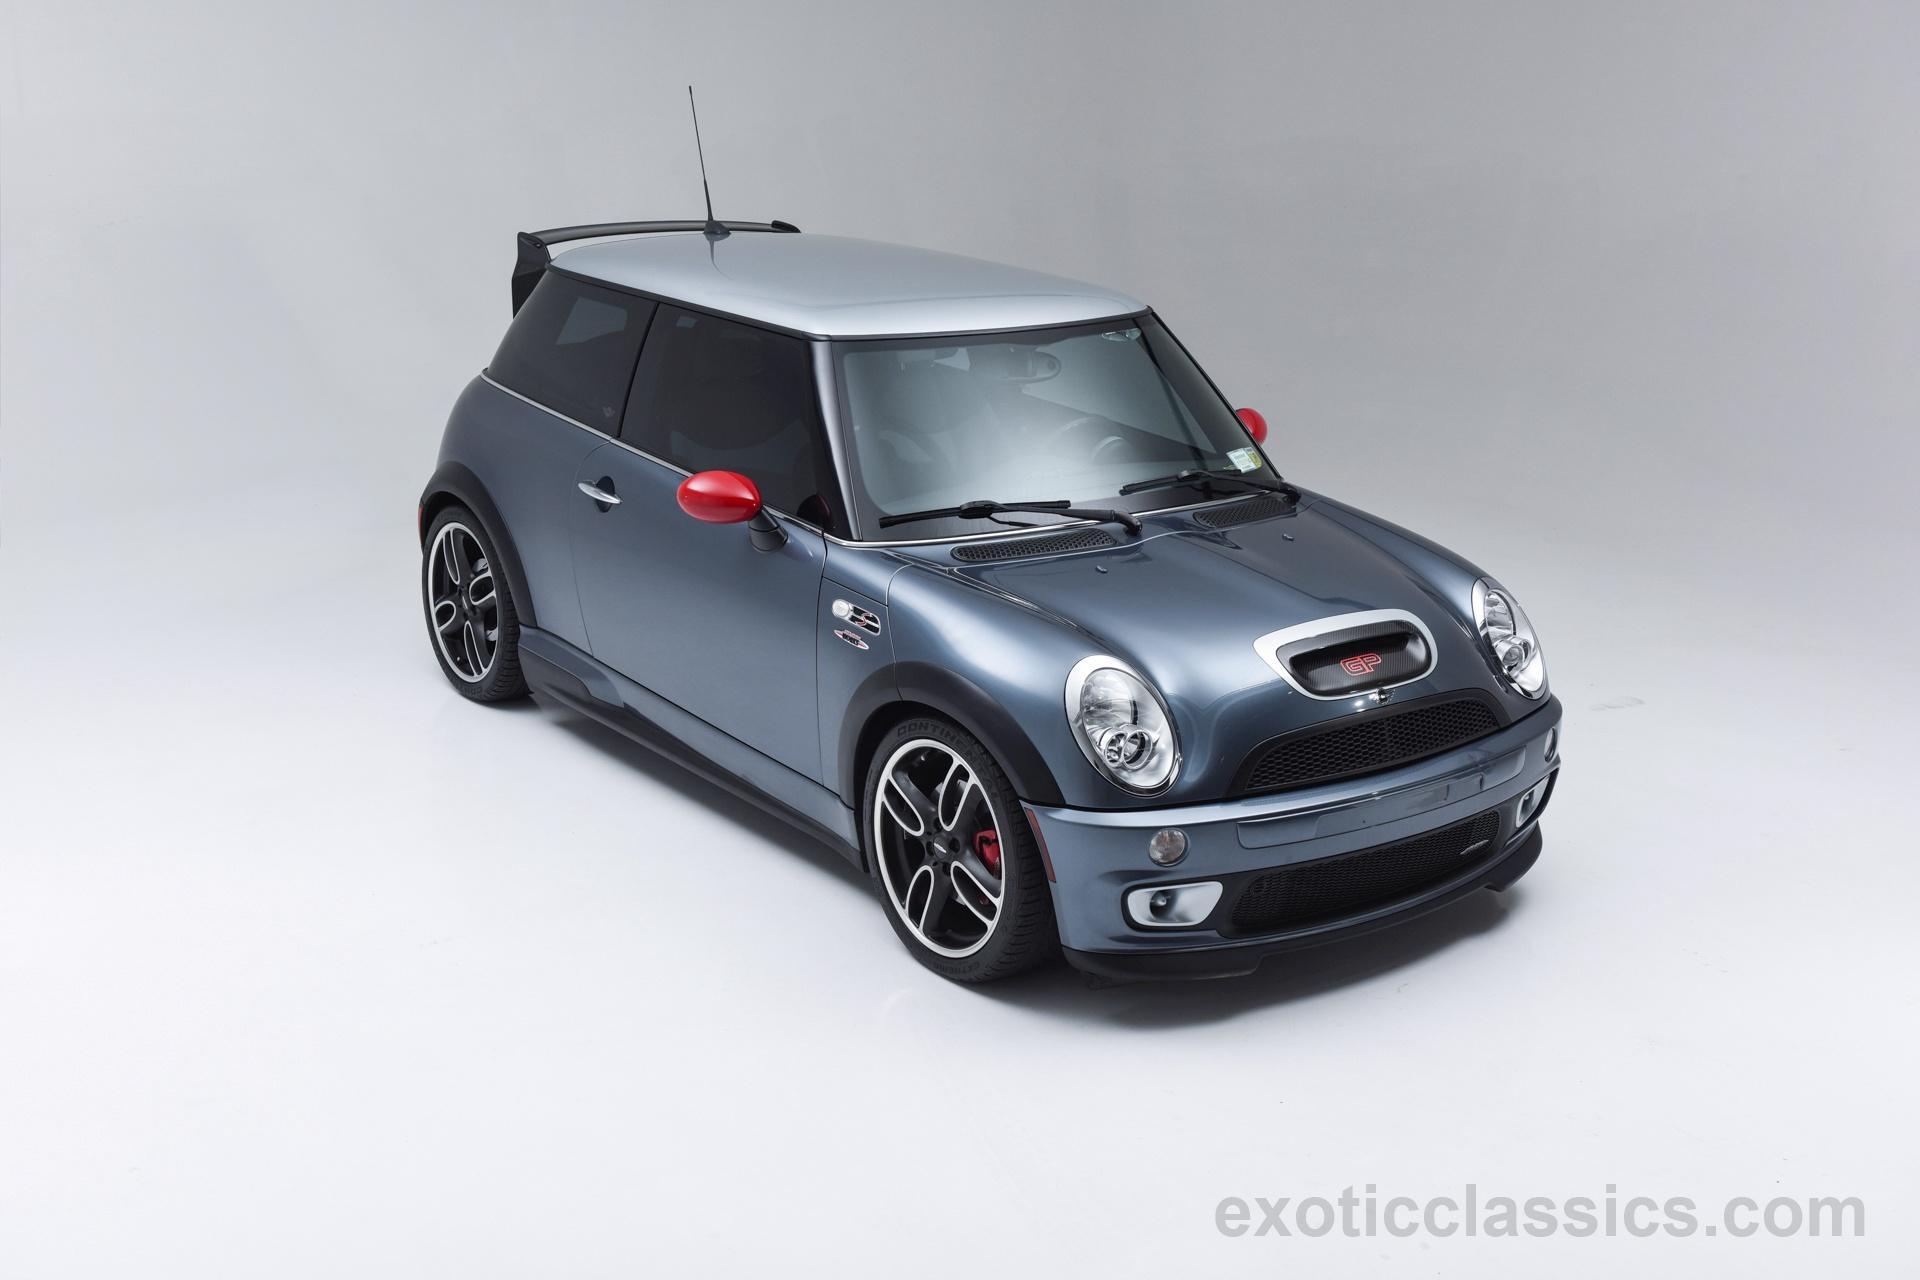 2006 Mini Cooper S John Works Gp Edition